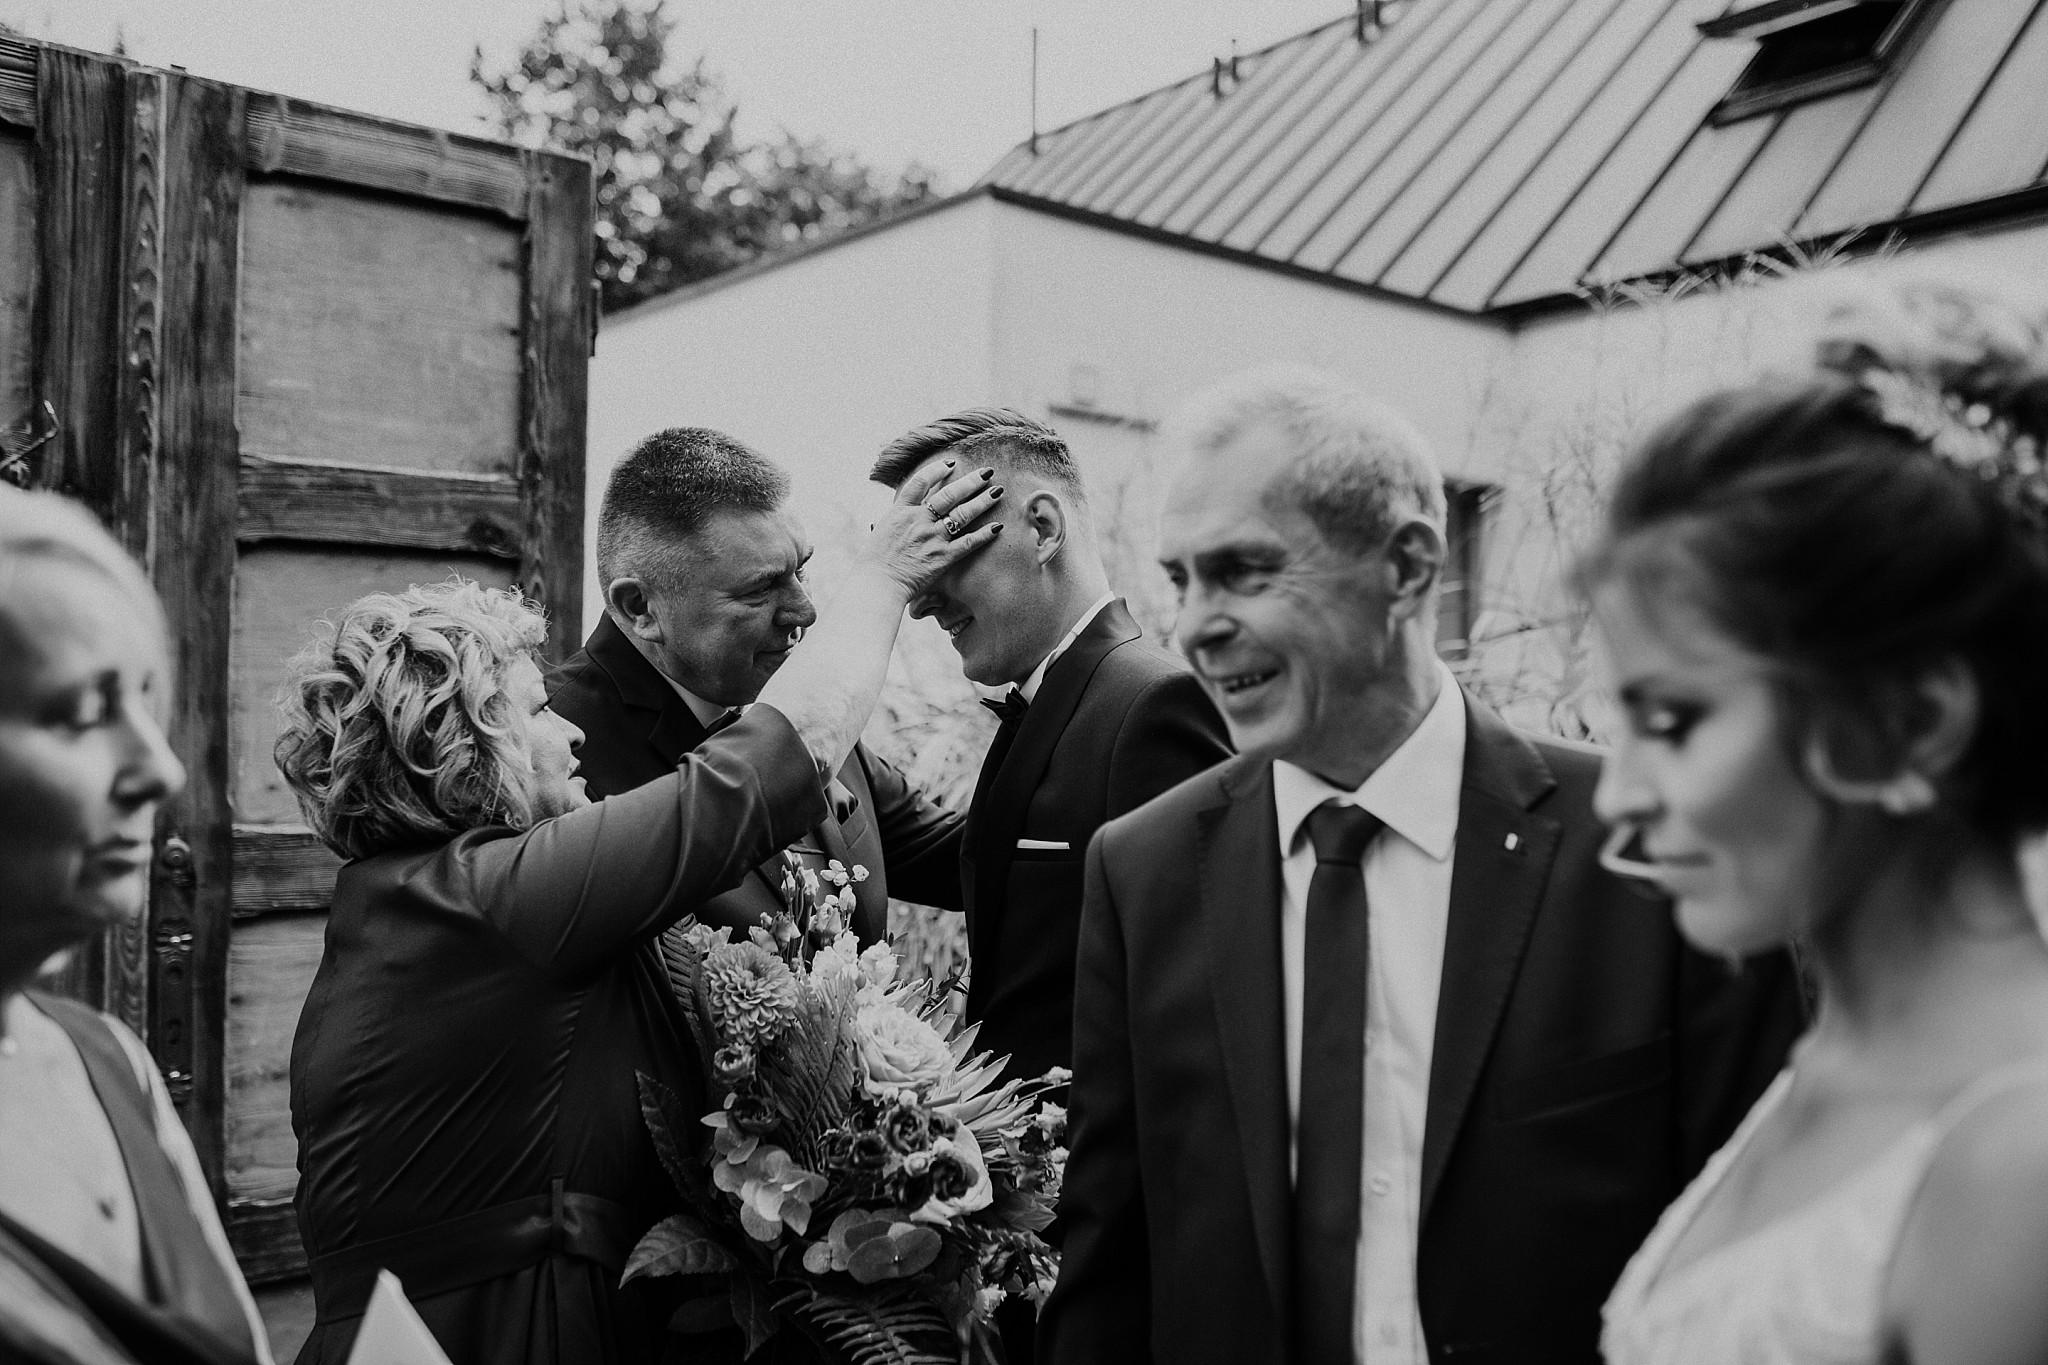 fotograf poznan wesele dobra truskawka piekne wesele pod poznaniem wesele w dobrej truskawce piekna para mloda slub marzen slub koronawirus slub listopad wesele koronawirus 103